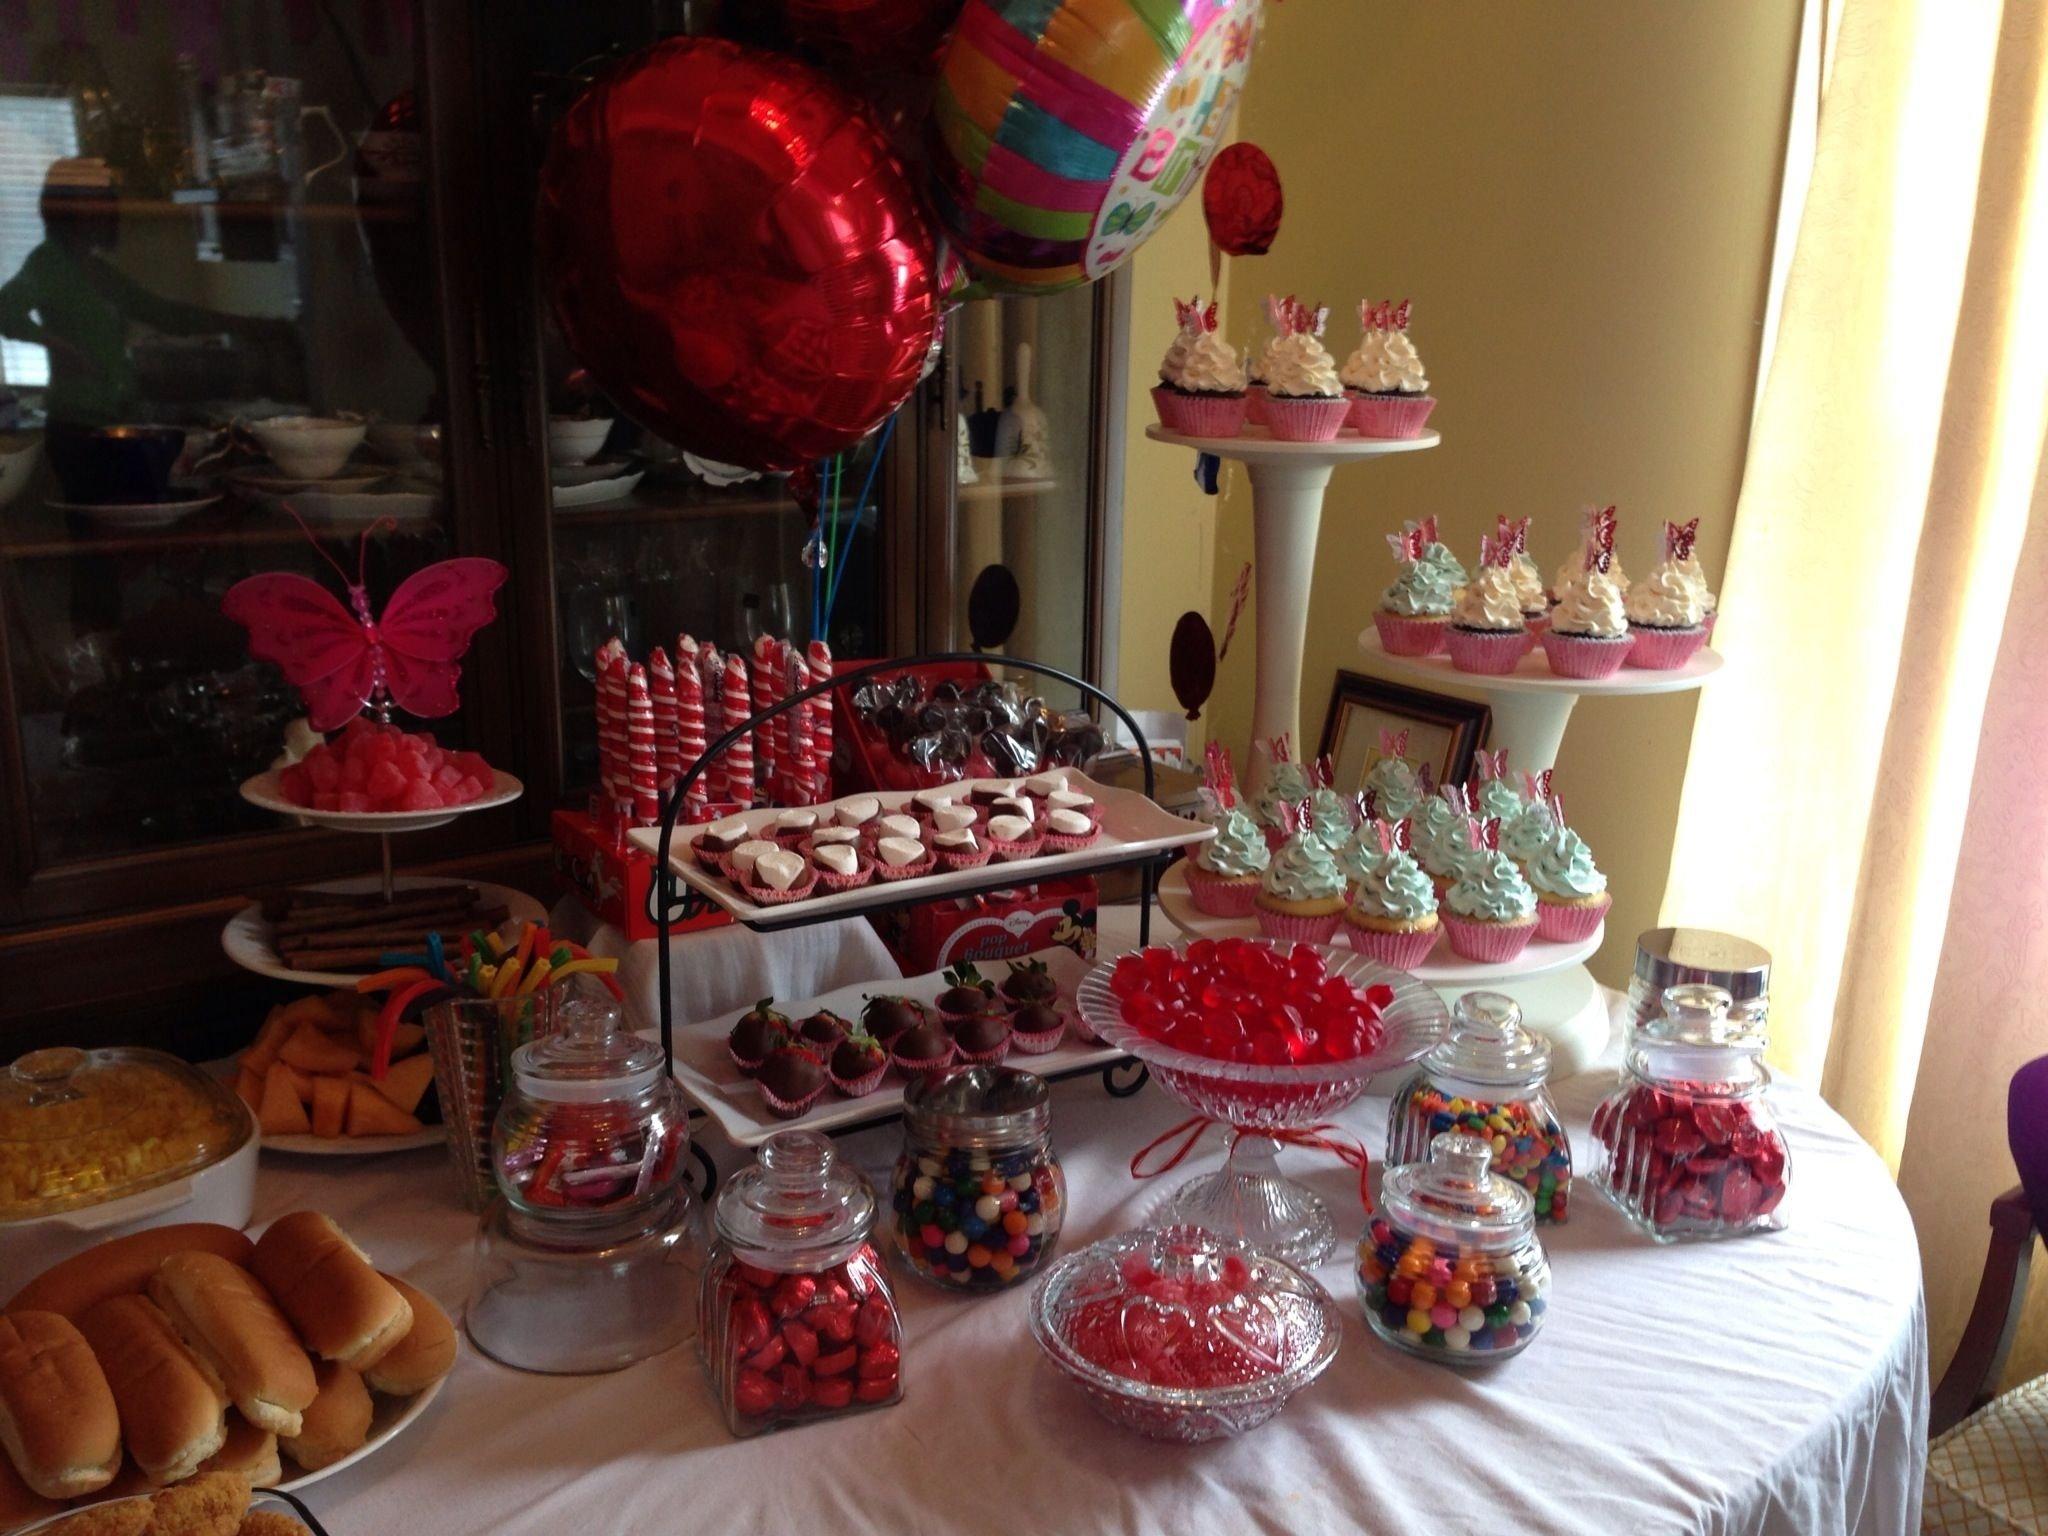 10 Pretty Ideas For A 13Th Birthday Party beas 13th birthday party party ideas pinterest 13th birthday 9 2021